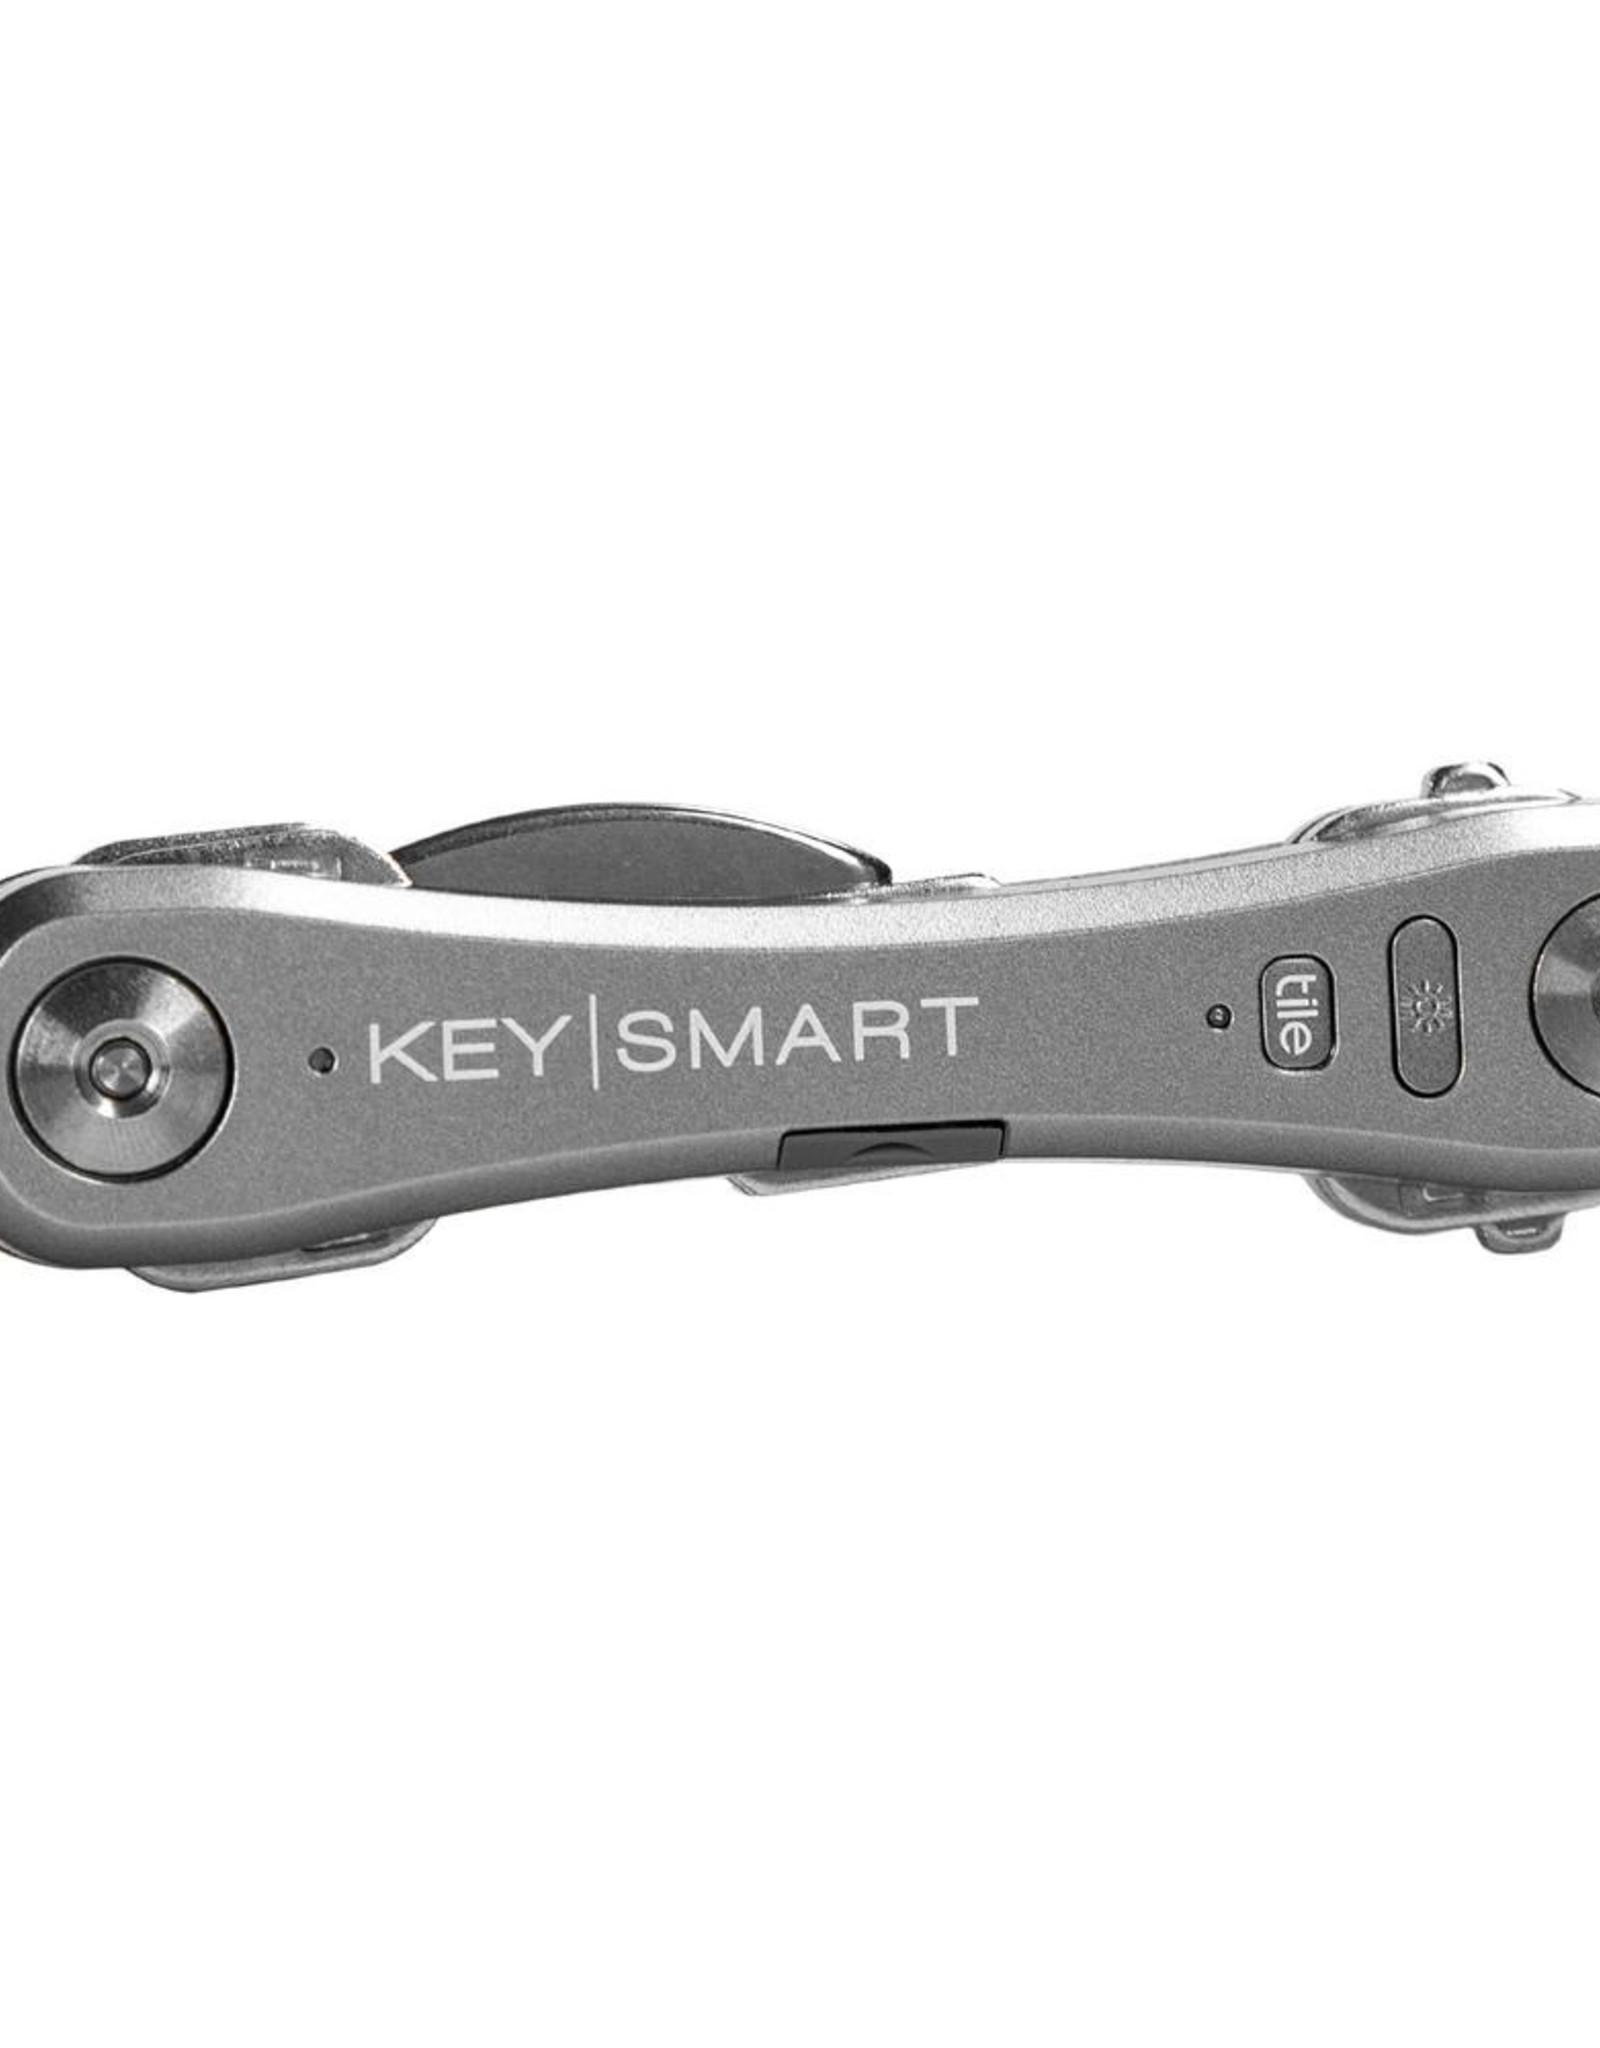 KEYSMART PRO COMPACT KEY HOLDER WITH TILE SMART LOCATION-SLATE KS411-SLT